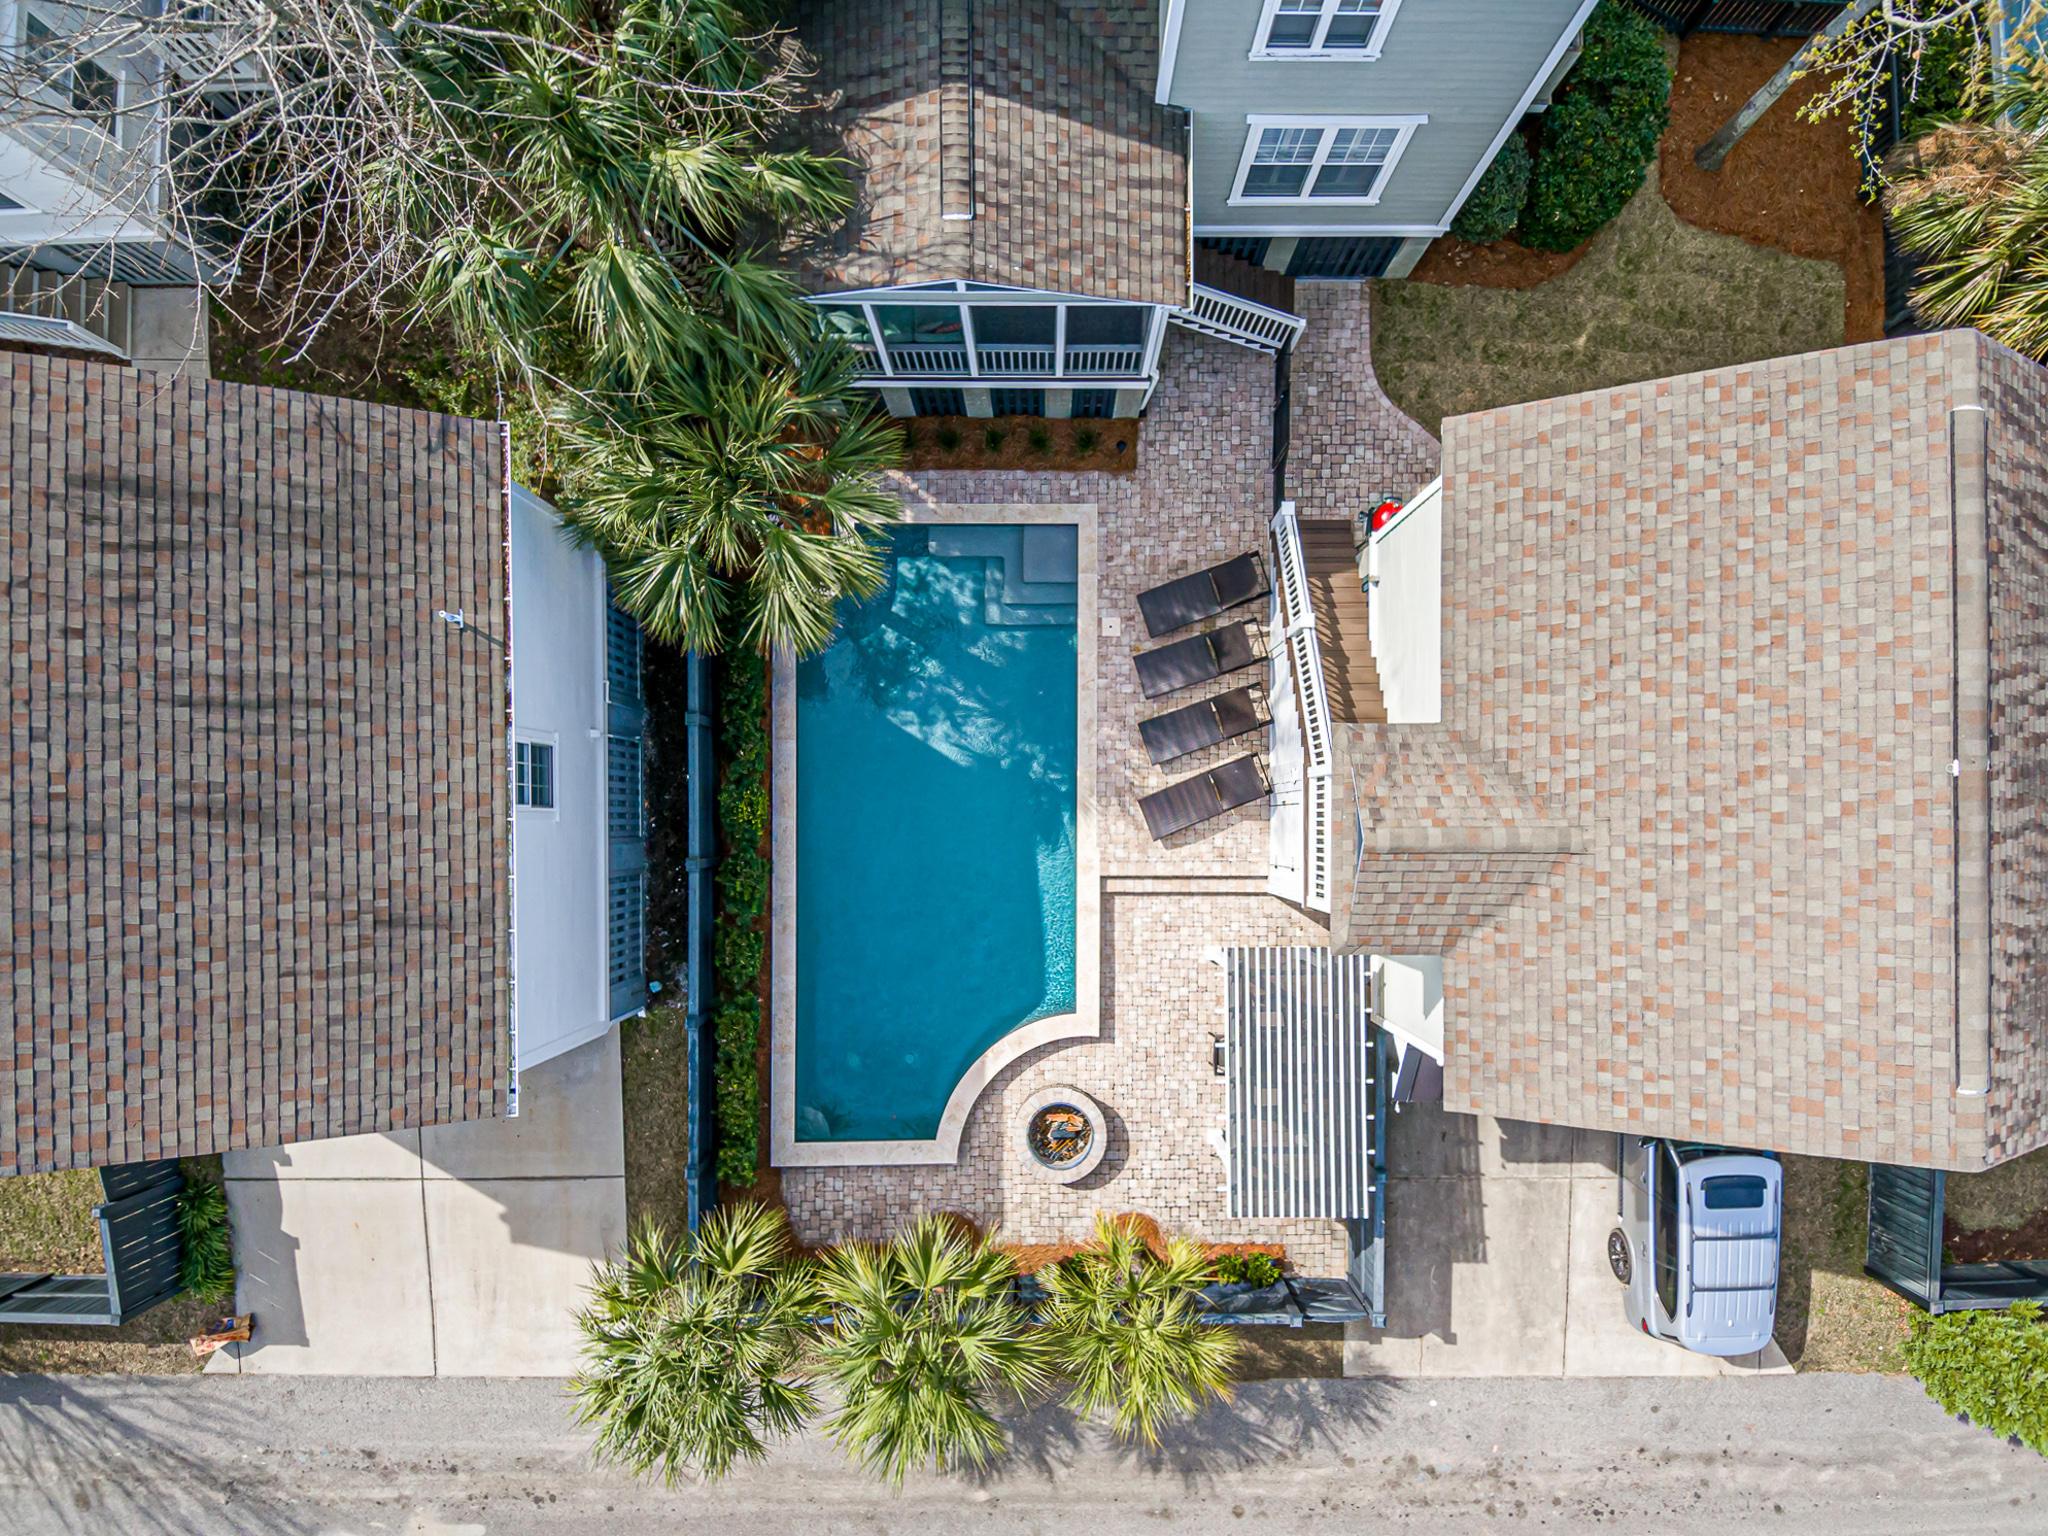 Daniel Island Smythe Park Homes For Sale - 1410 Wando View, Charleston, SC - 15